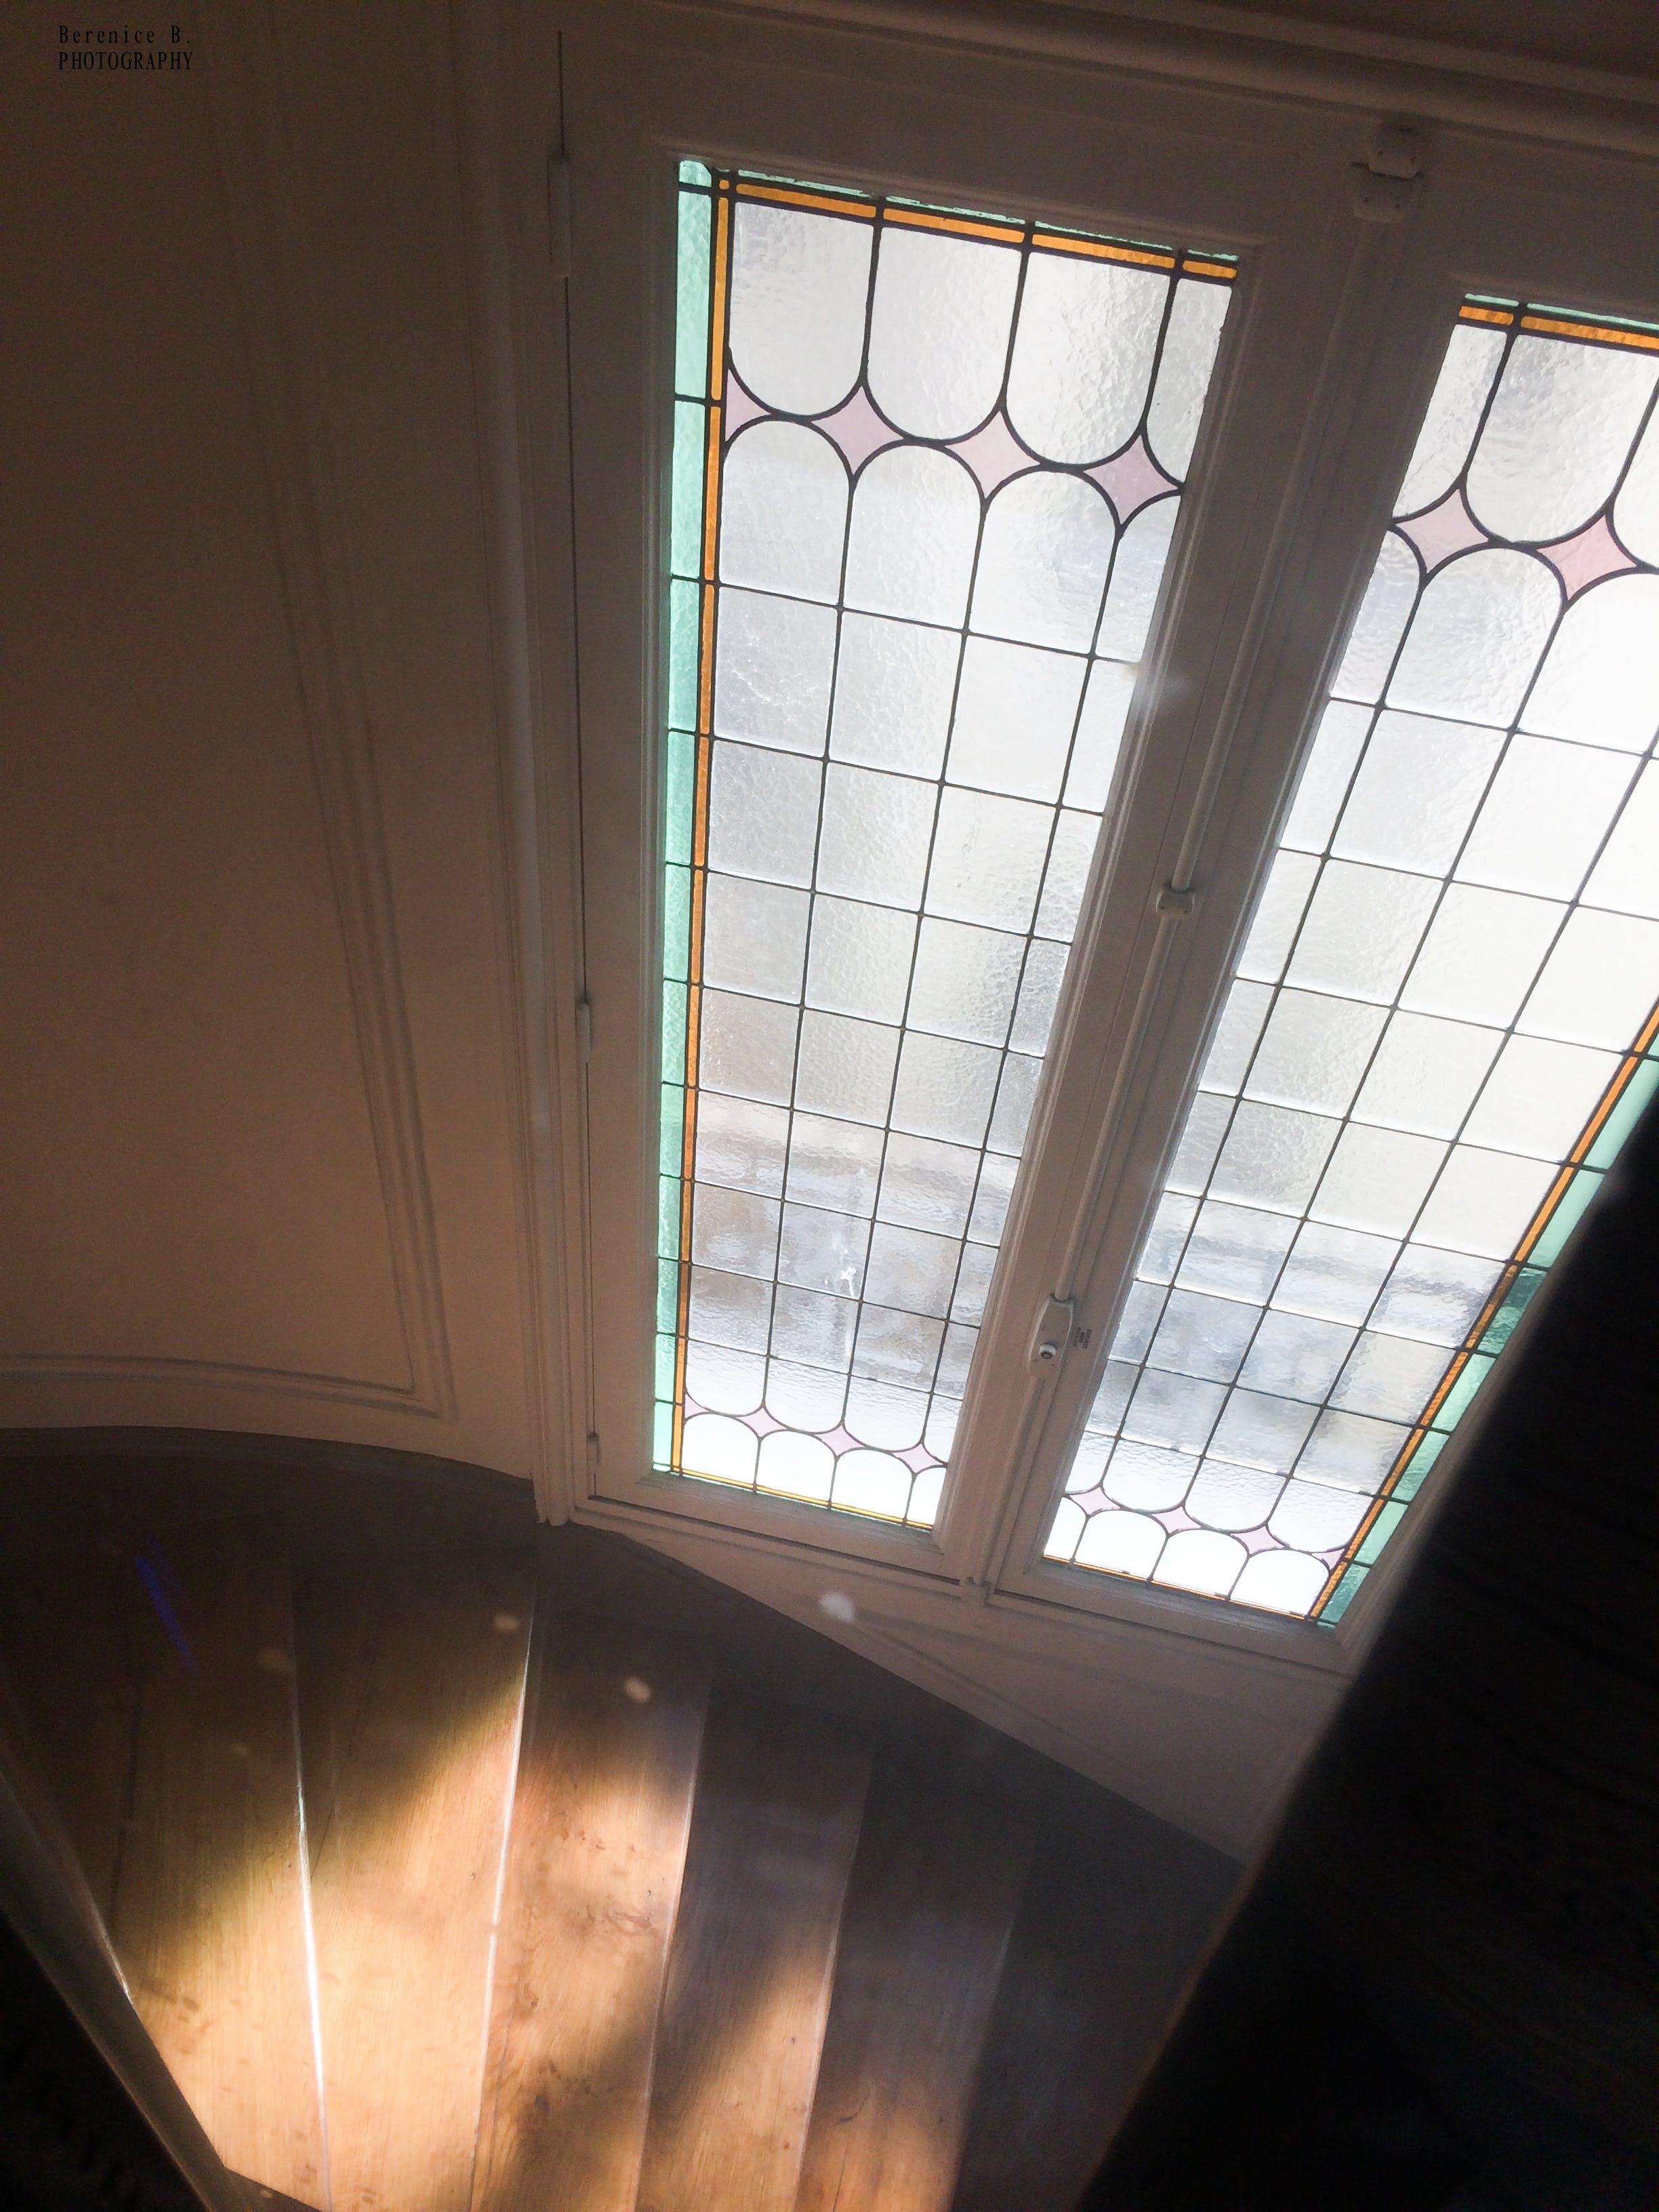 Free stock photo of escalier, fenetre, vitrage, vitrail